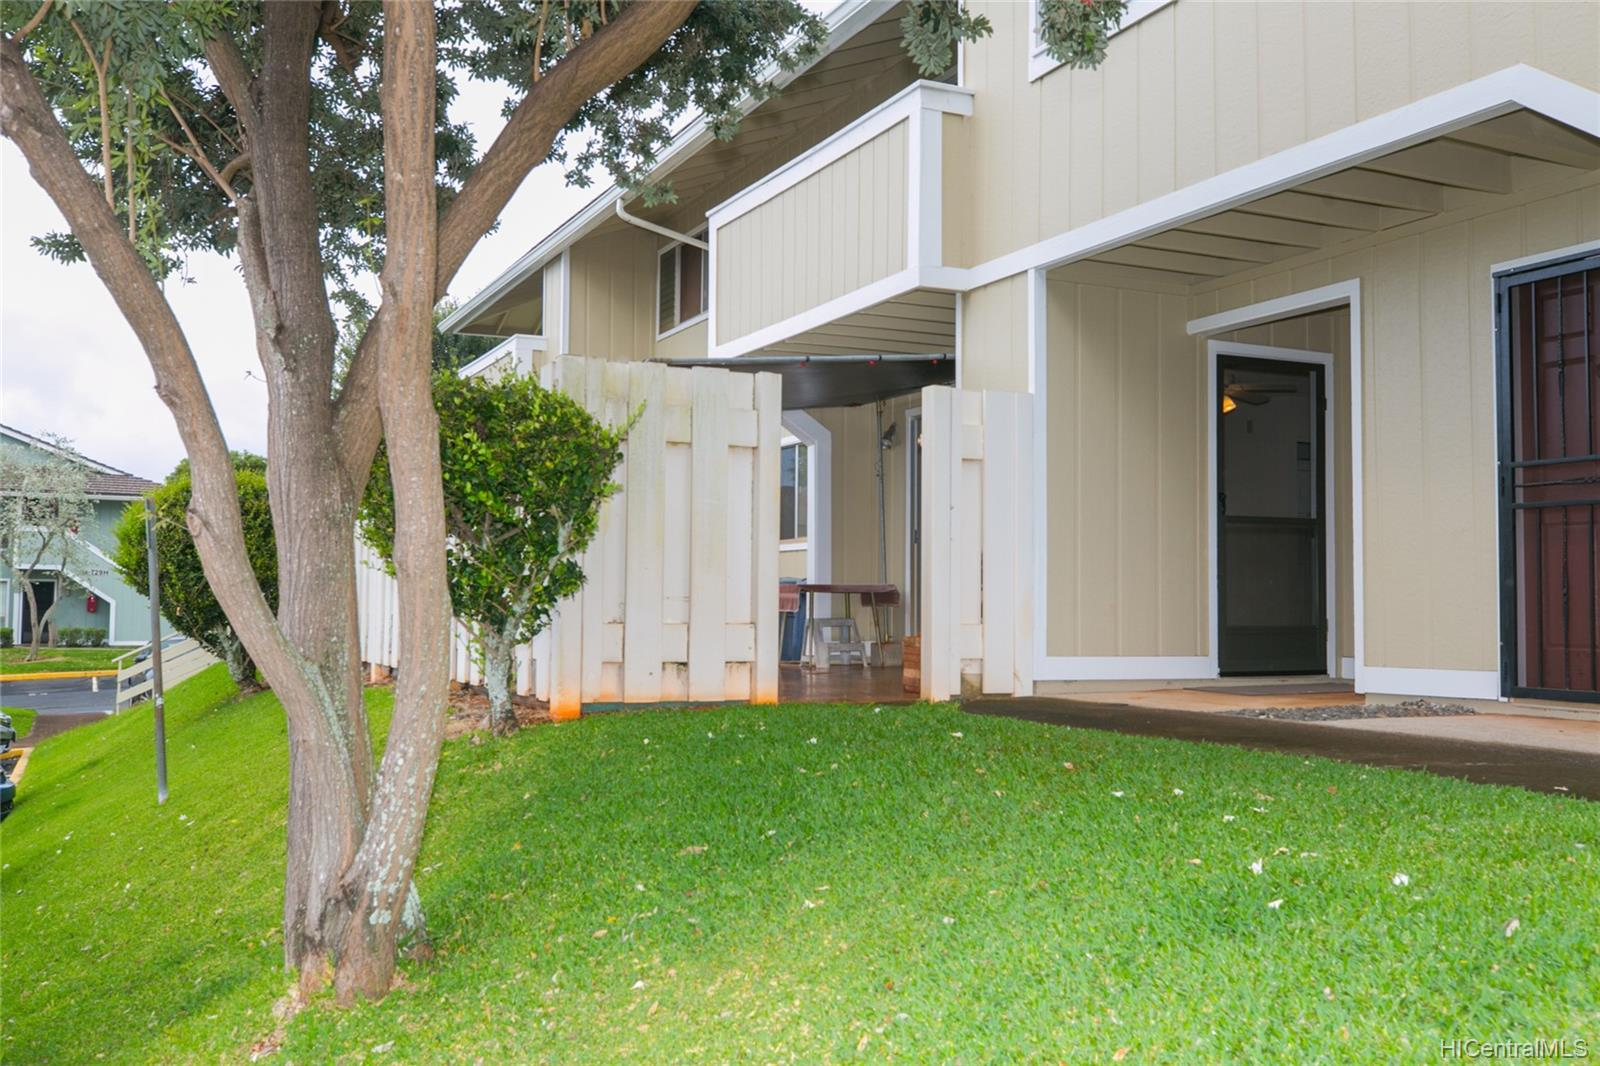 94-724 Paaono Street townhouse # Y2, Waipahu, Hawaii - photo 24 of 24